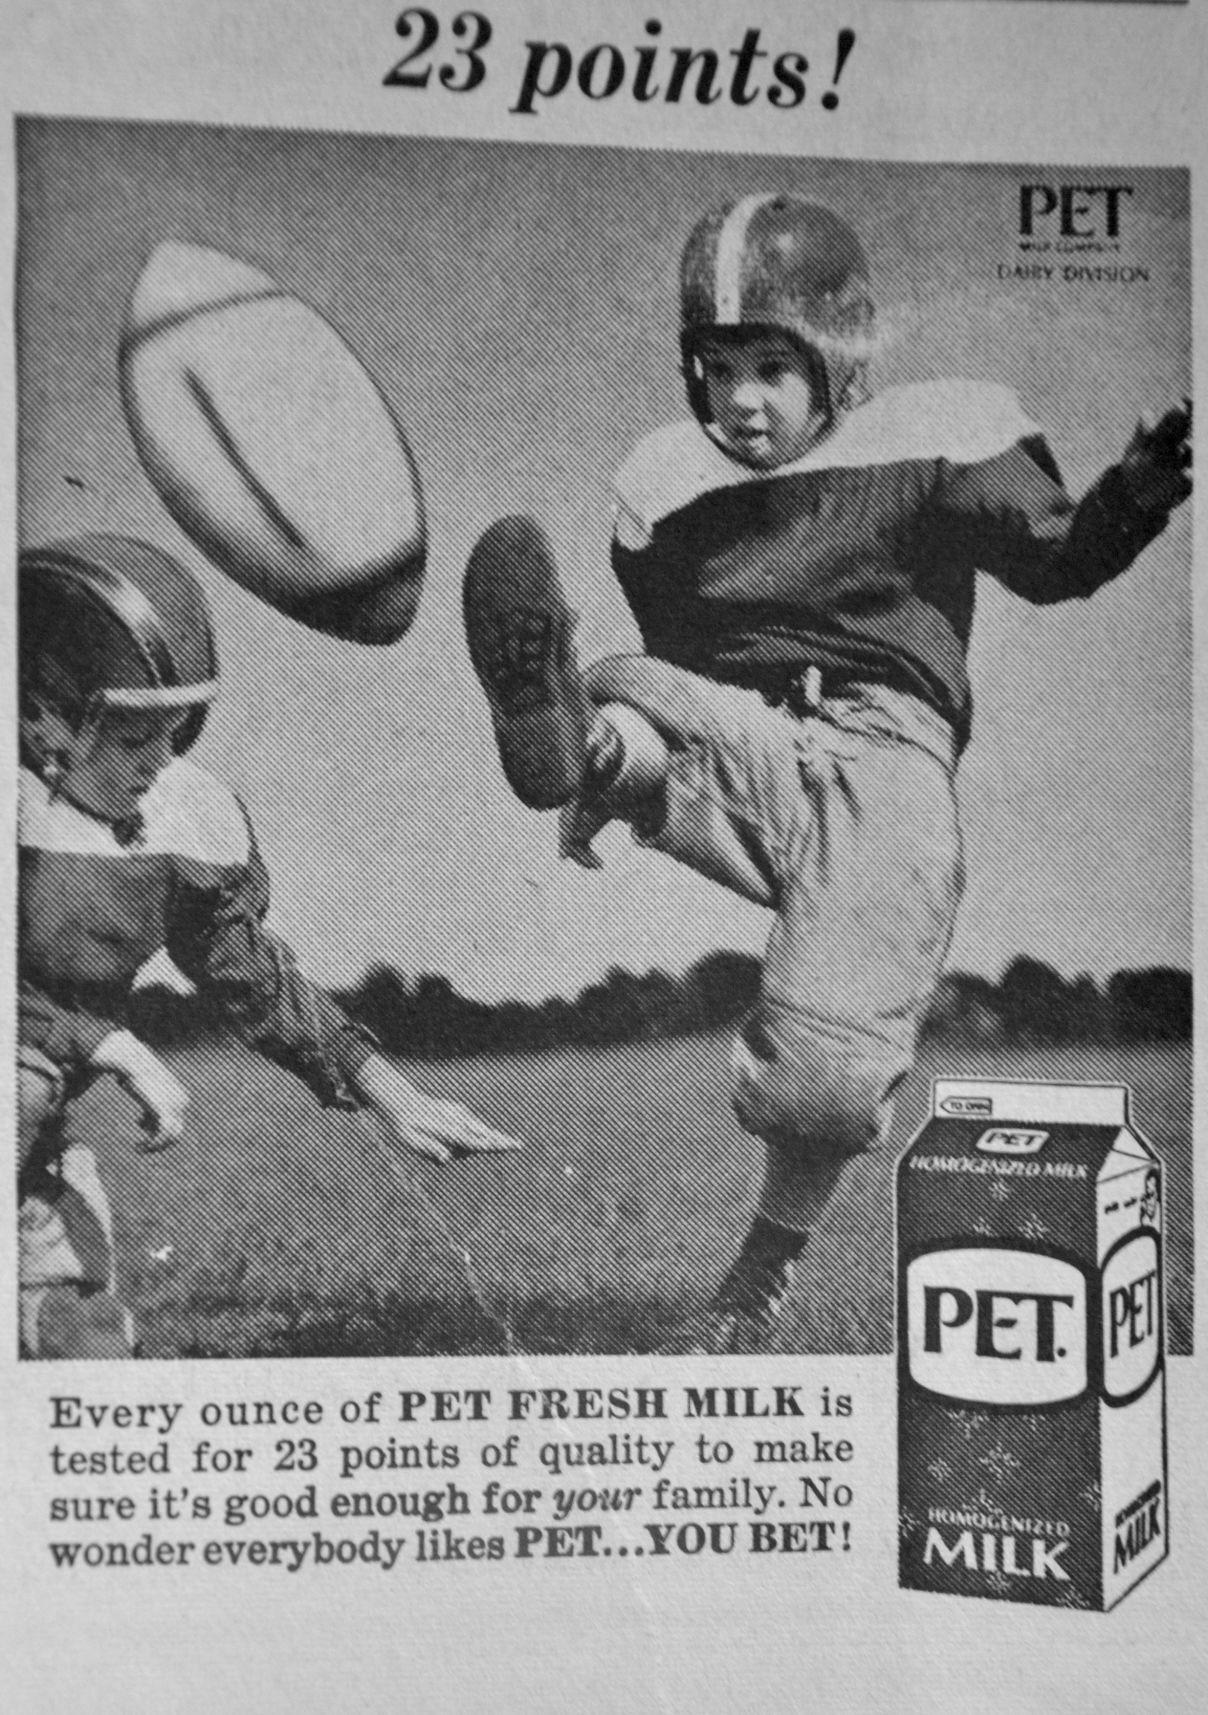 1966 advertisement